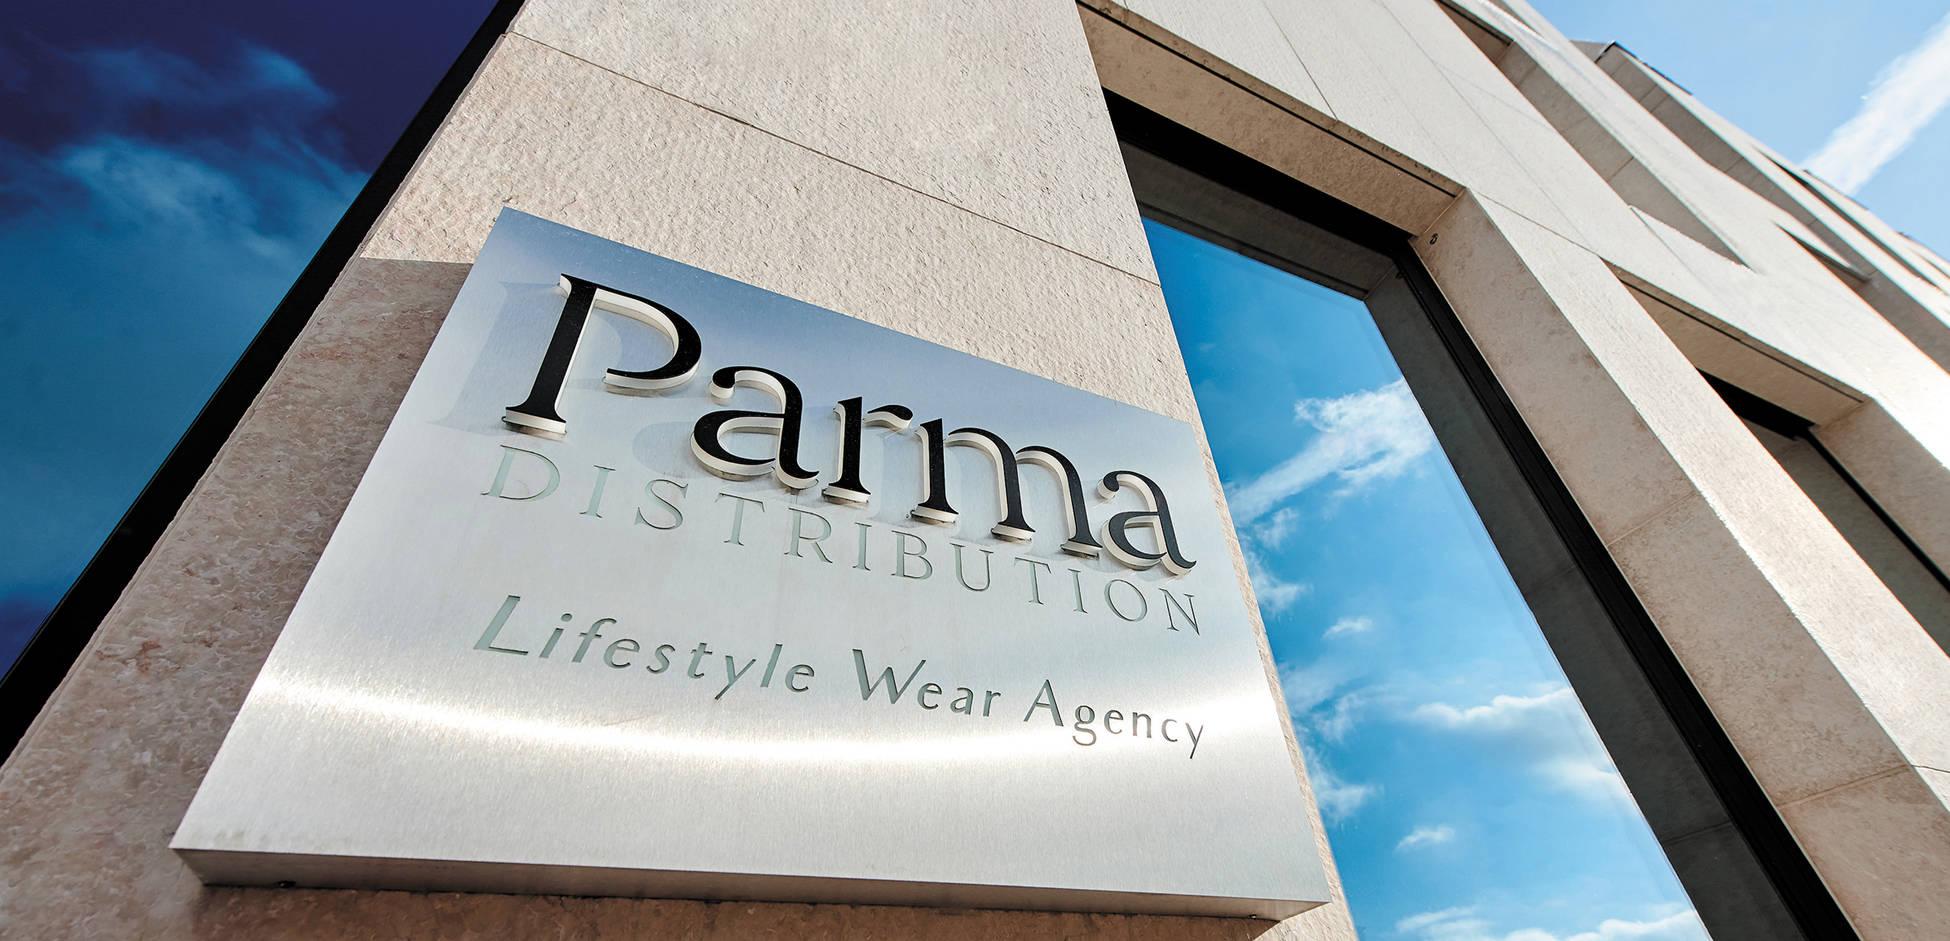 Param Distribution office